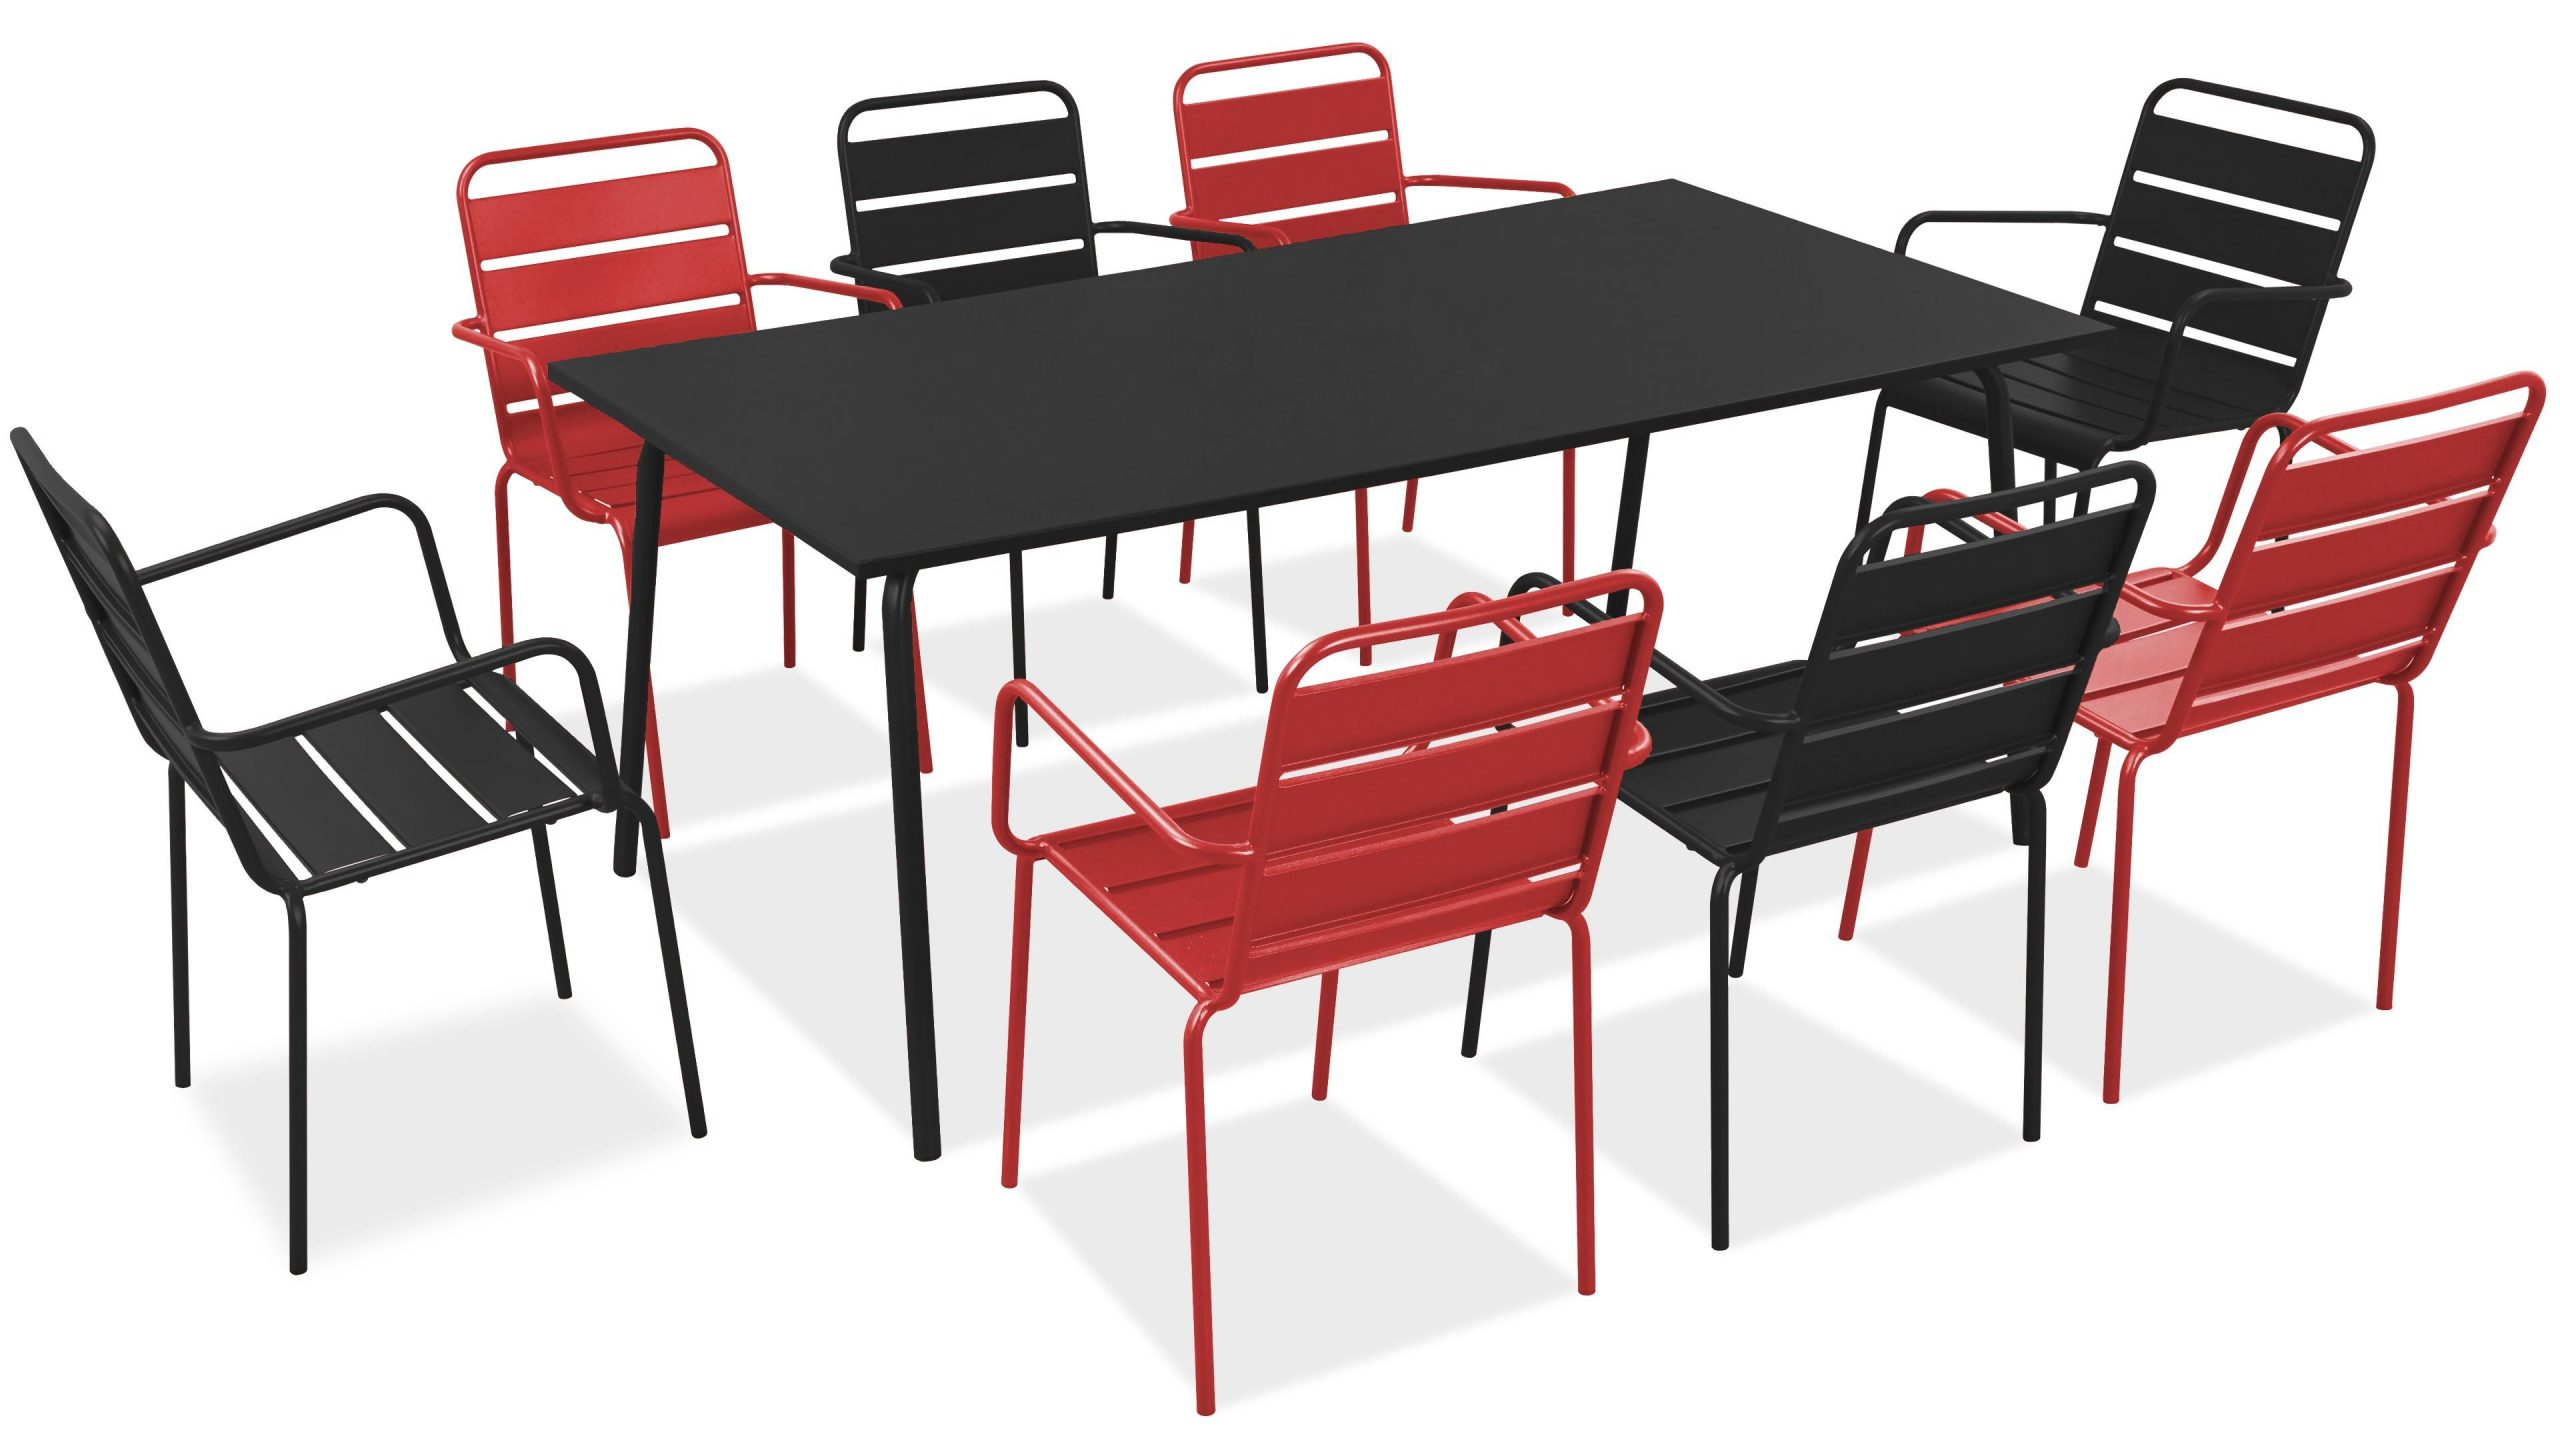 Salon De Jardin Metal Table Et Fauteuils dedans Salon De Jardin En Metal De Couleur